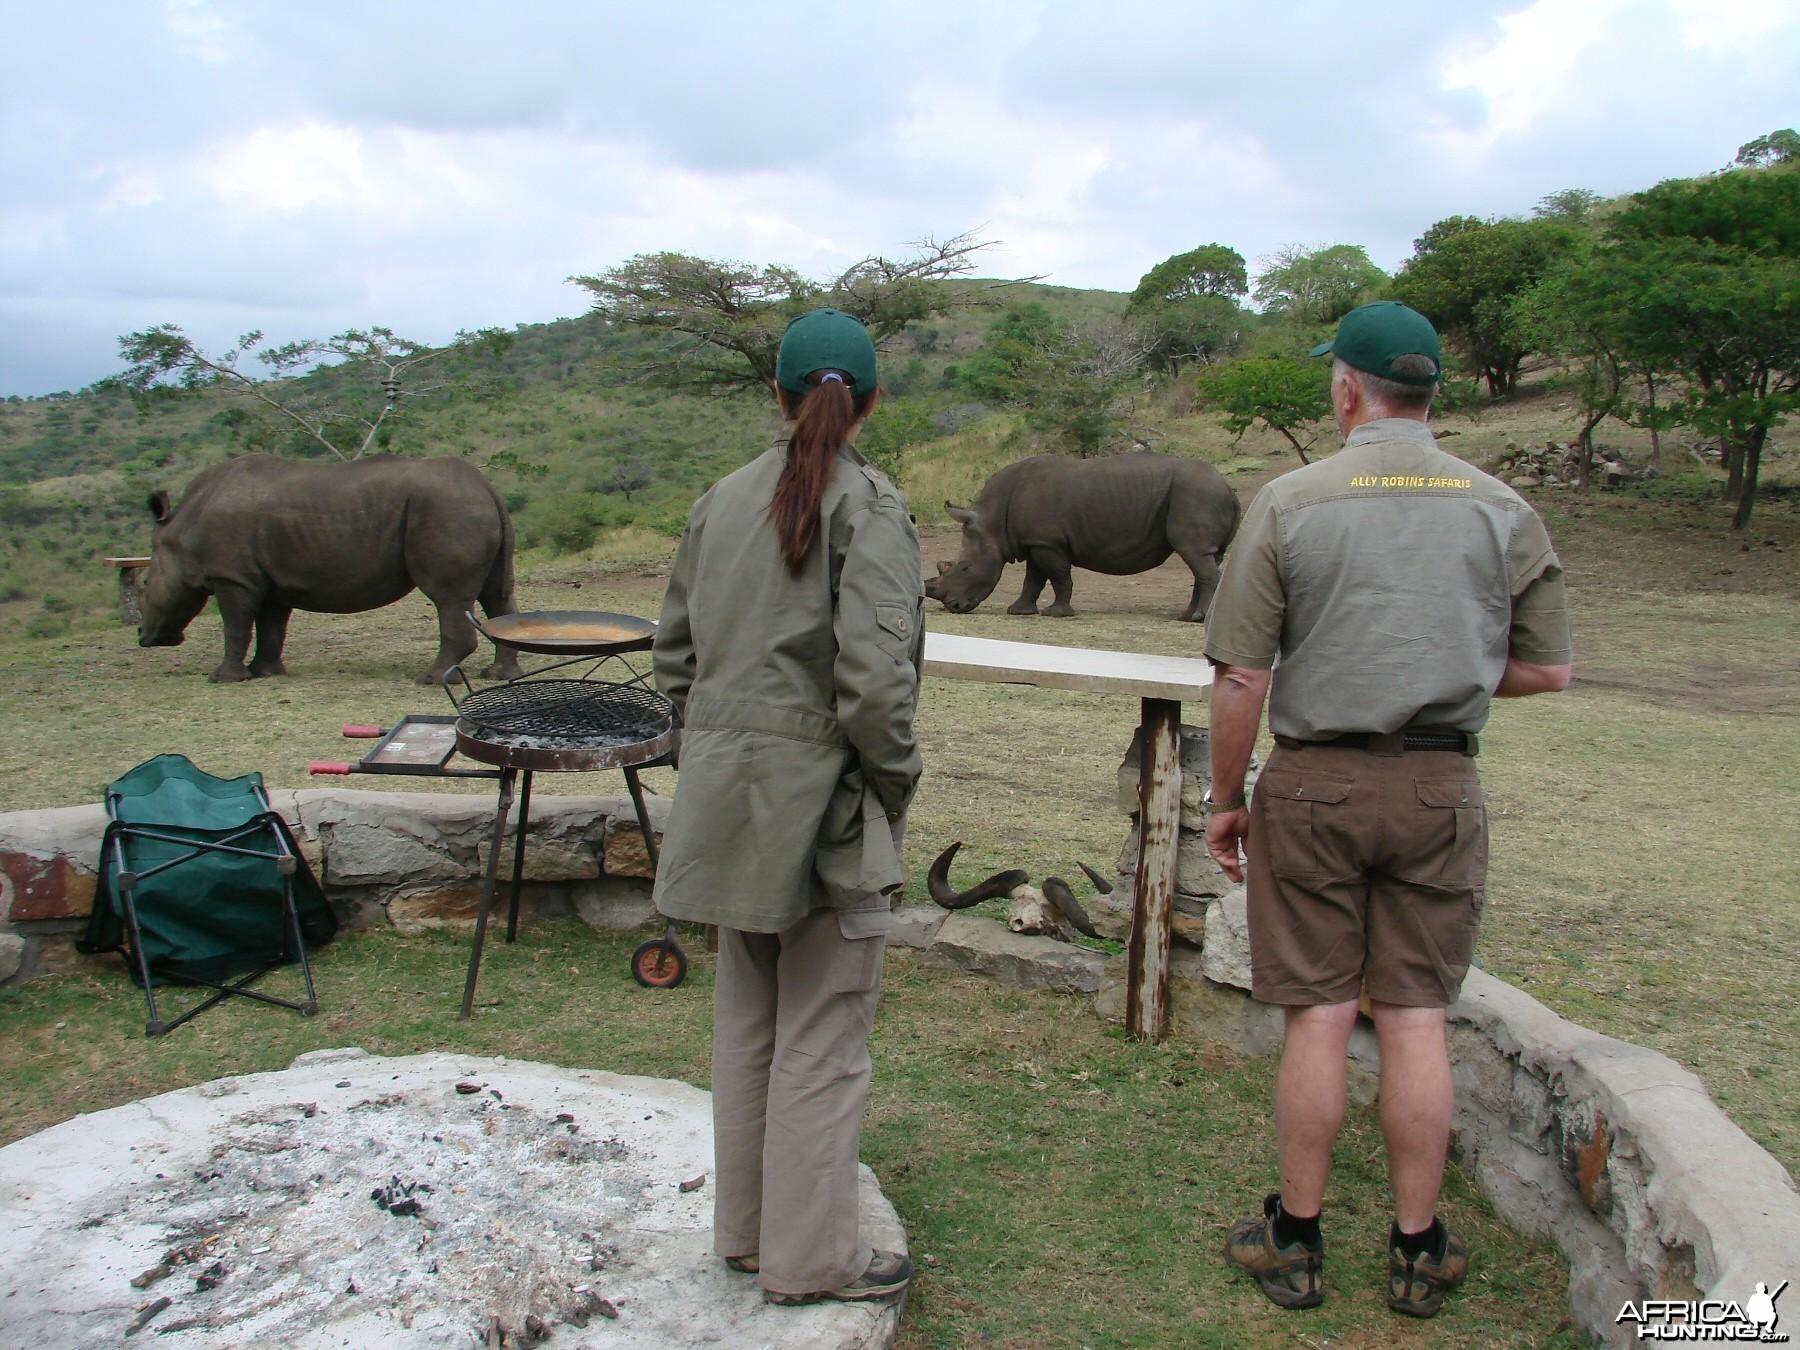 Rhino Kwa Zulu Natal